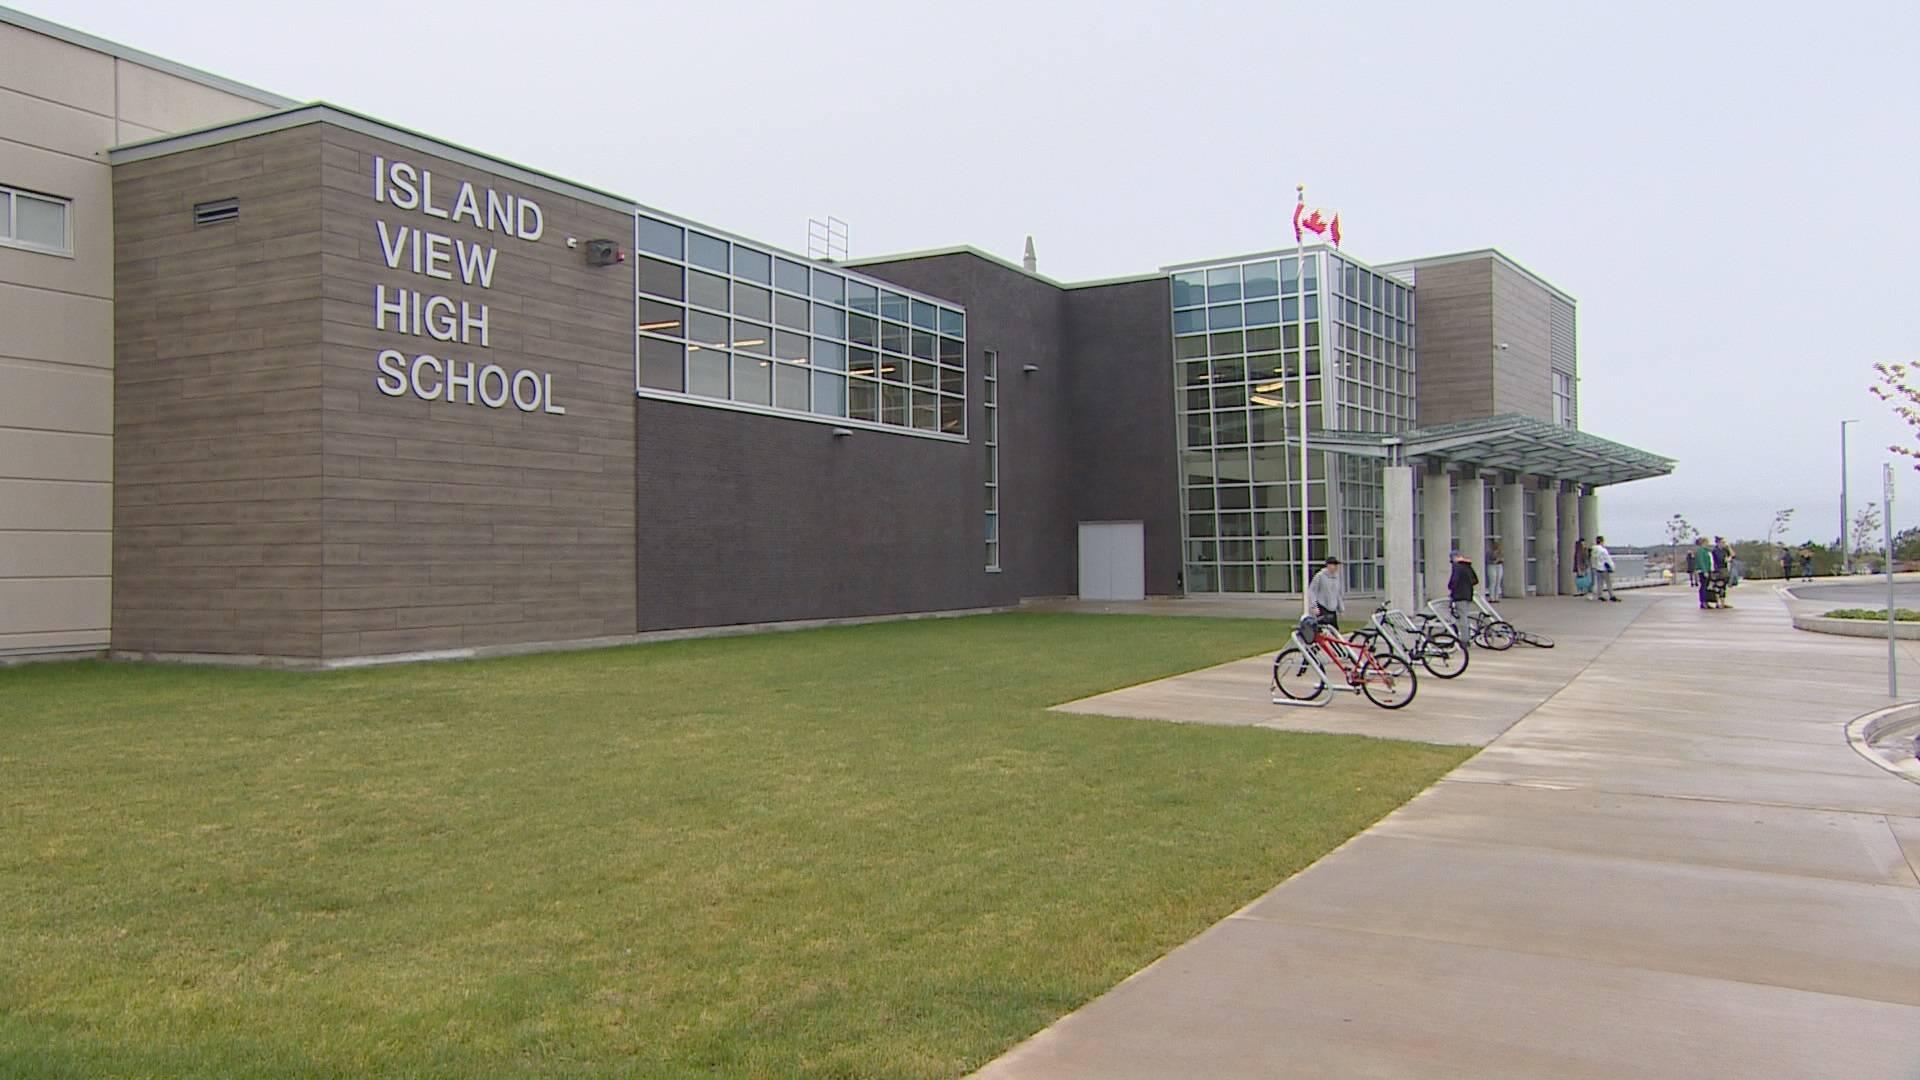 island-view-high-school.jpg